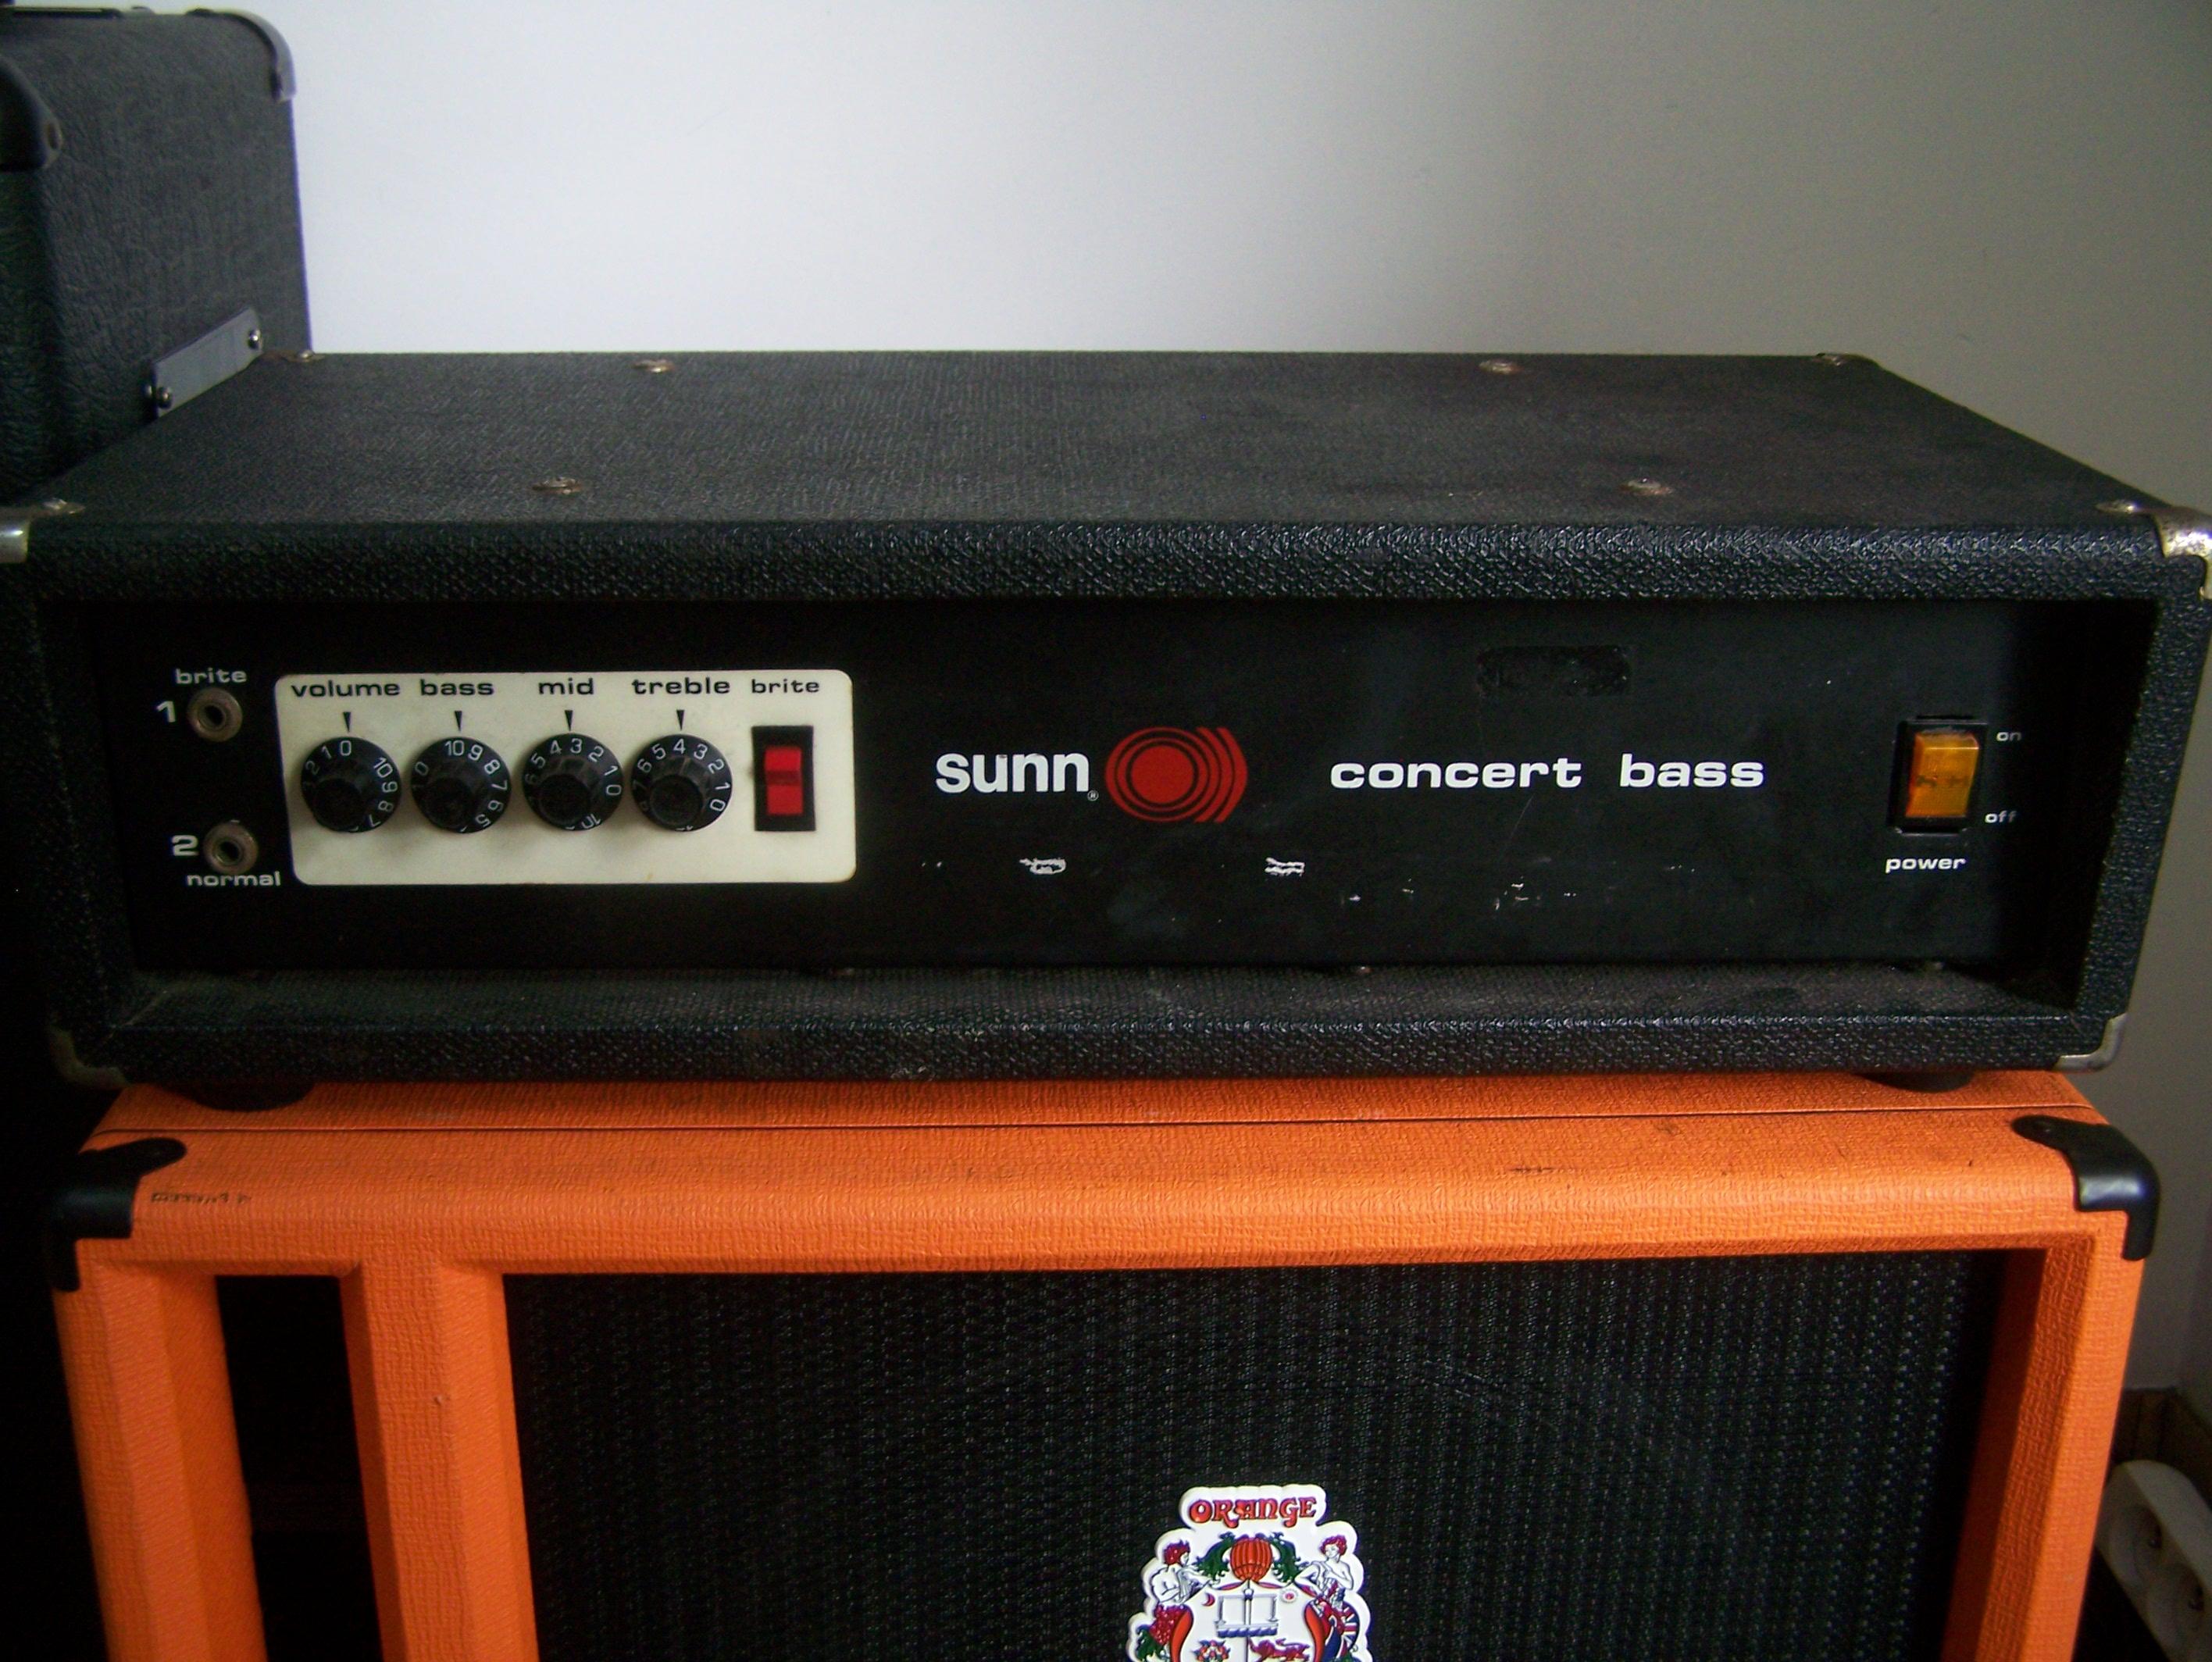 sunn concert bass image 419929 audiofanzine. Black Bedroom Furniture Sets. Home Design Ideas